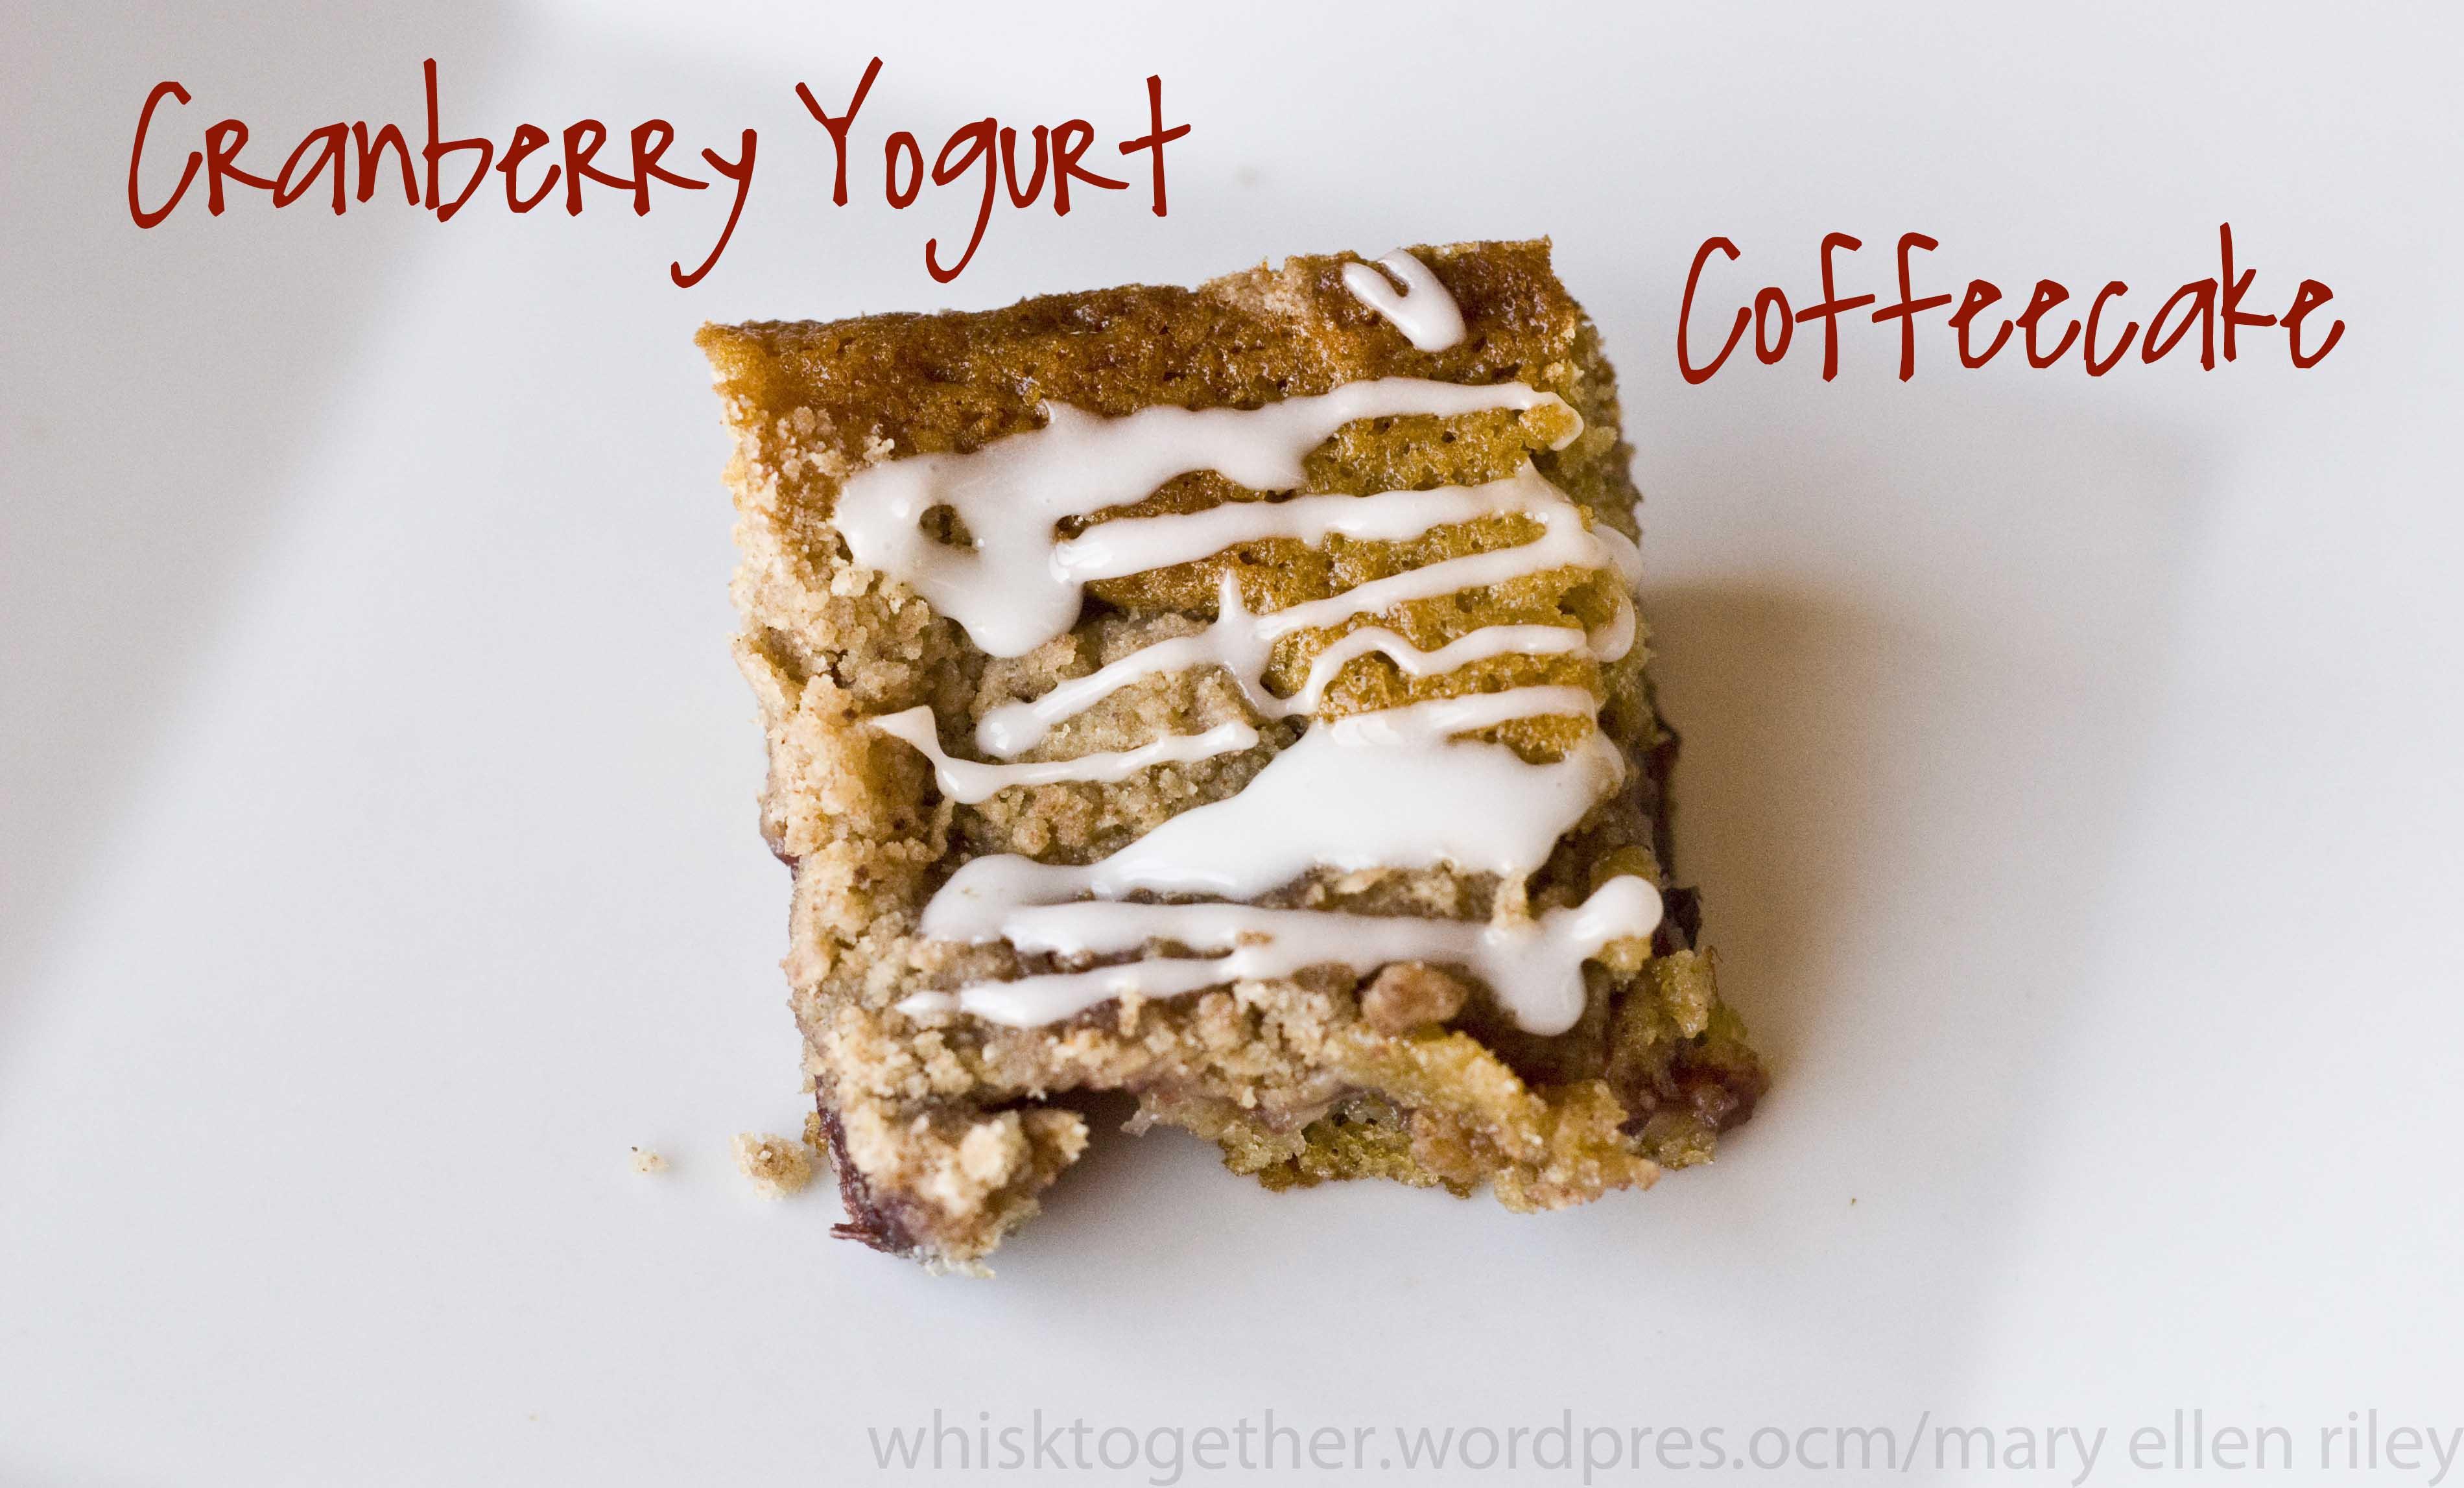 ... Try Cranberry Yogurt Coffeecake! I'm such a sucker for coffeecake